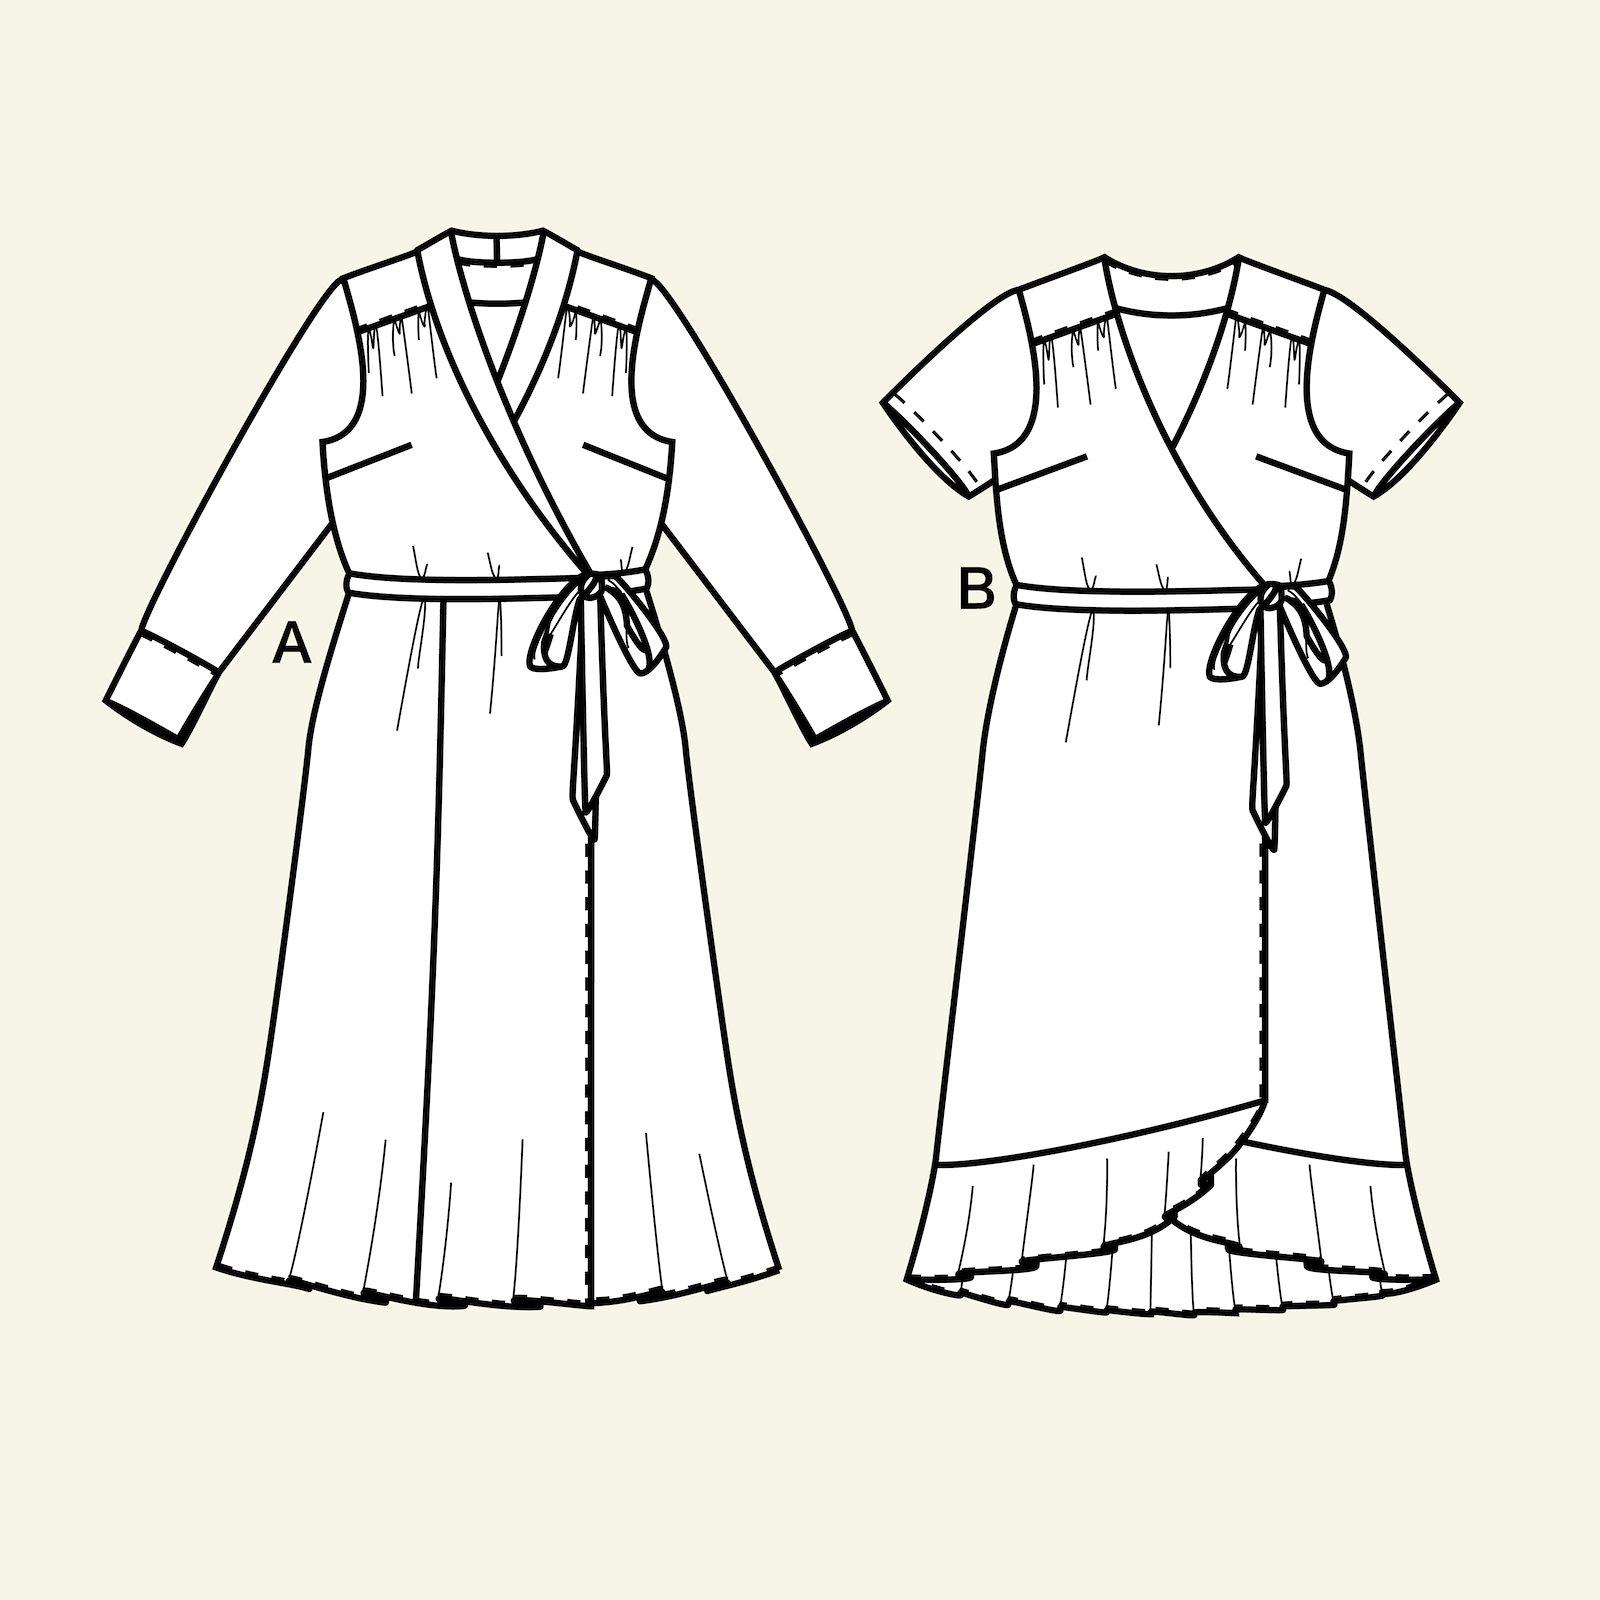 Wrap around dress, 34/6 p23160_pack